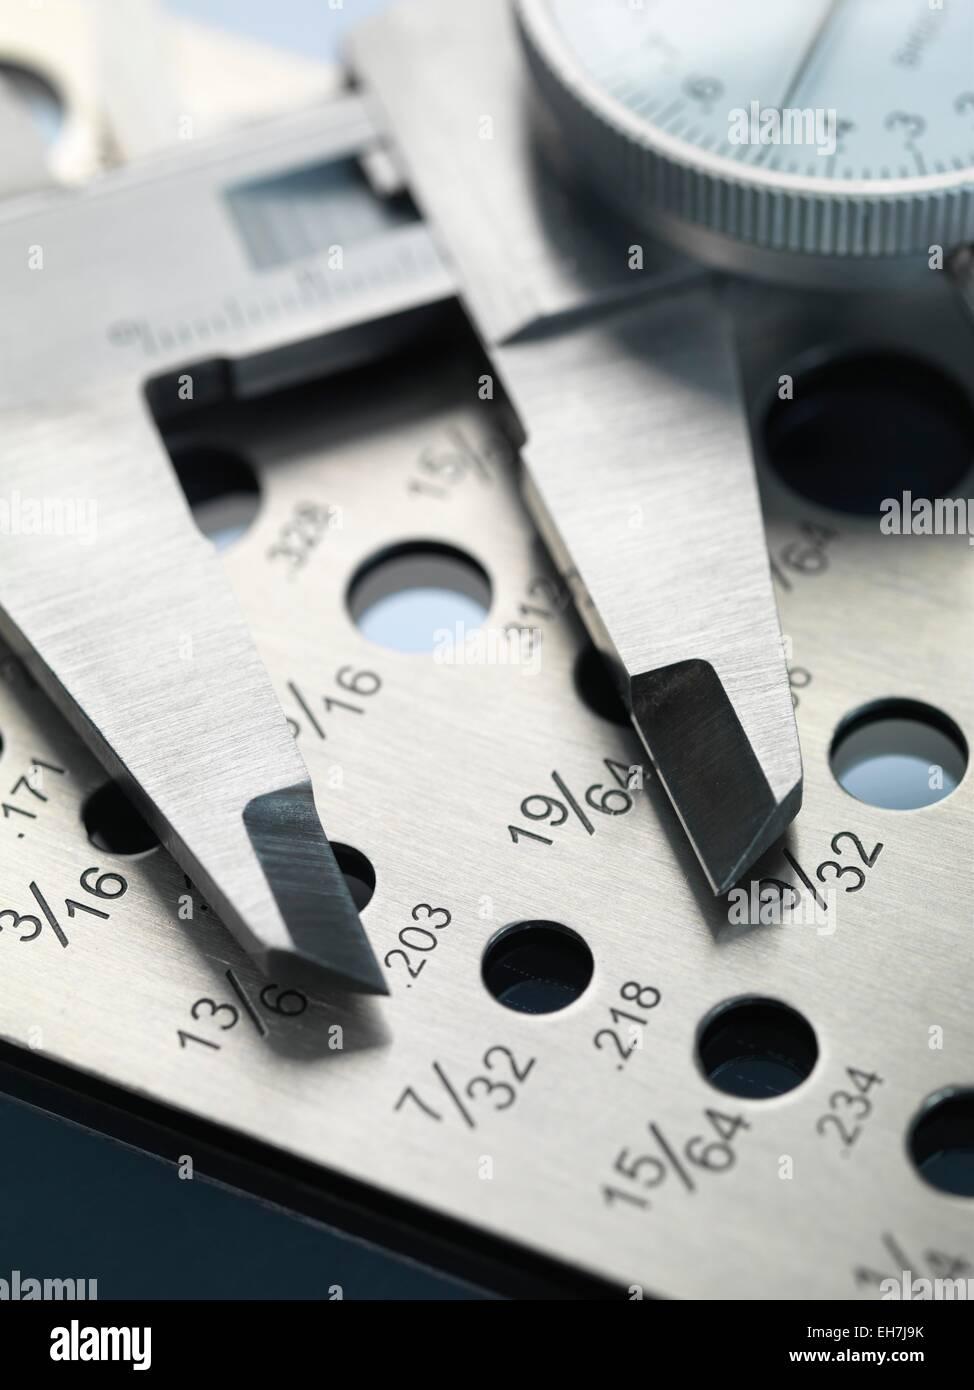 Engineering measurement tools - Stock Image